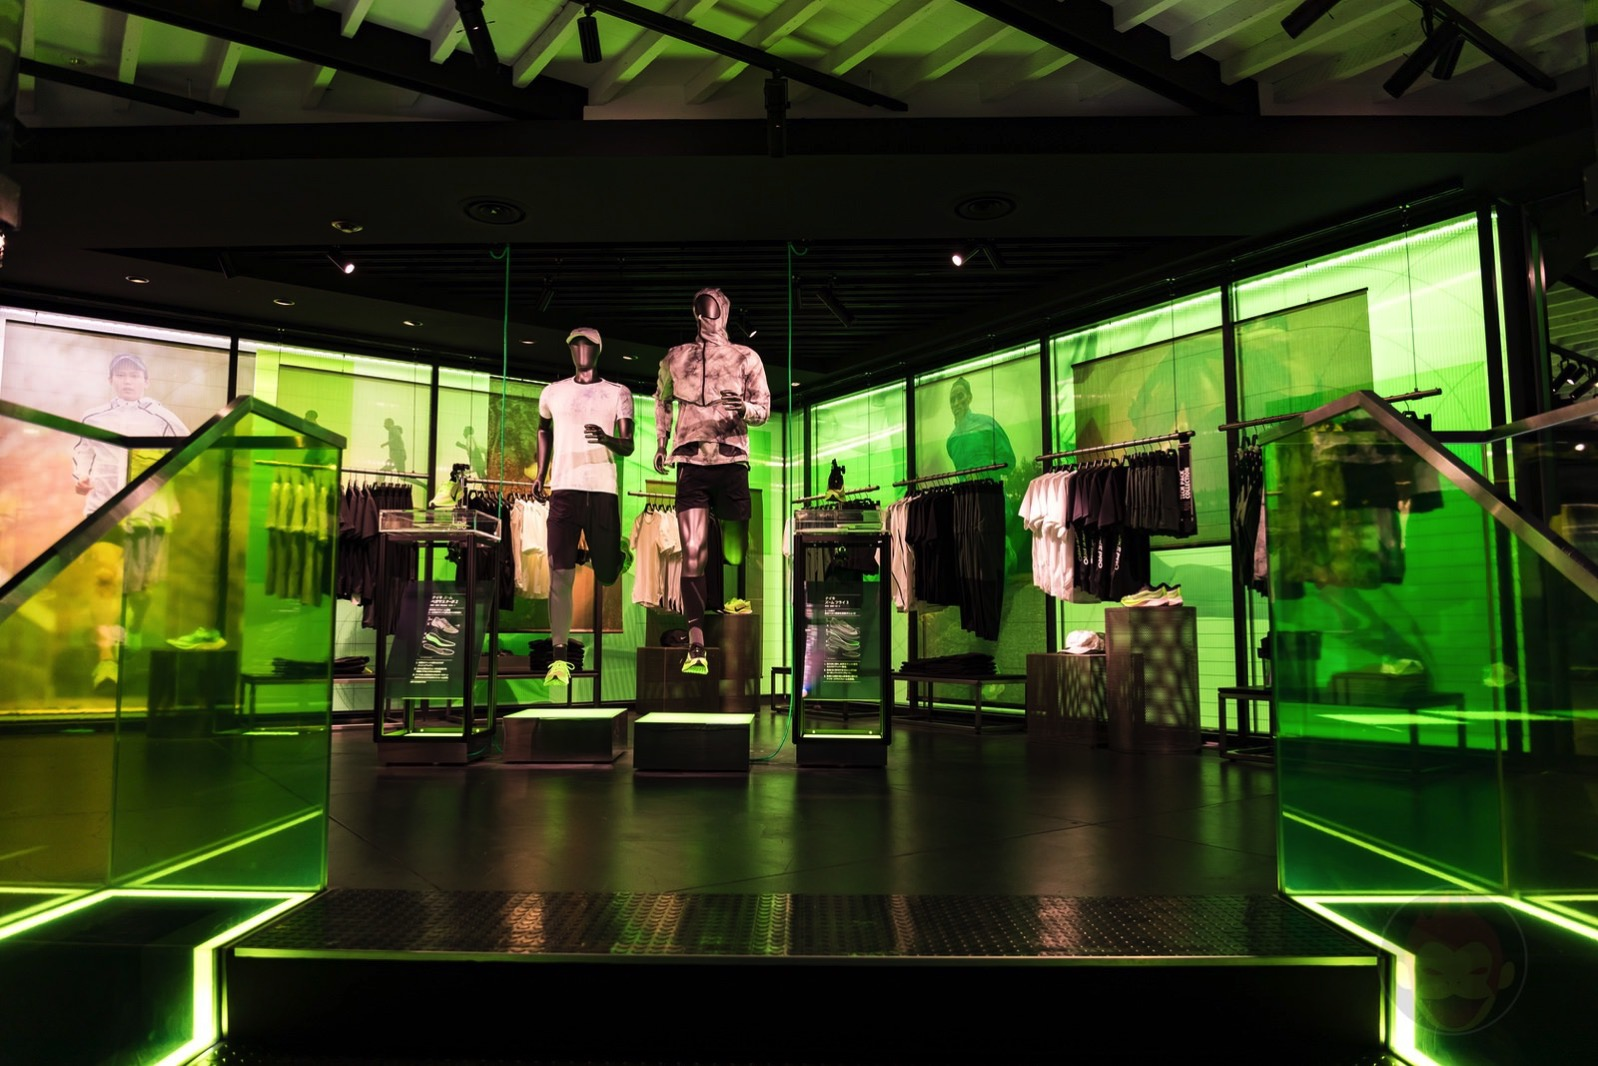 Nike-Harajuku-Renewal-09.jpg